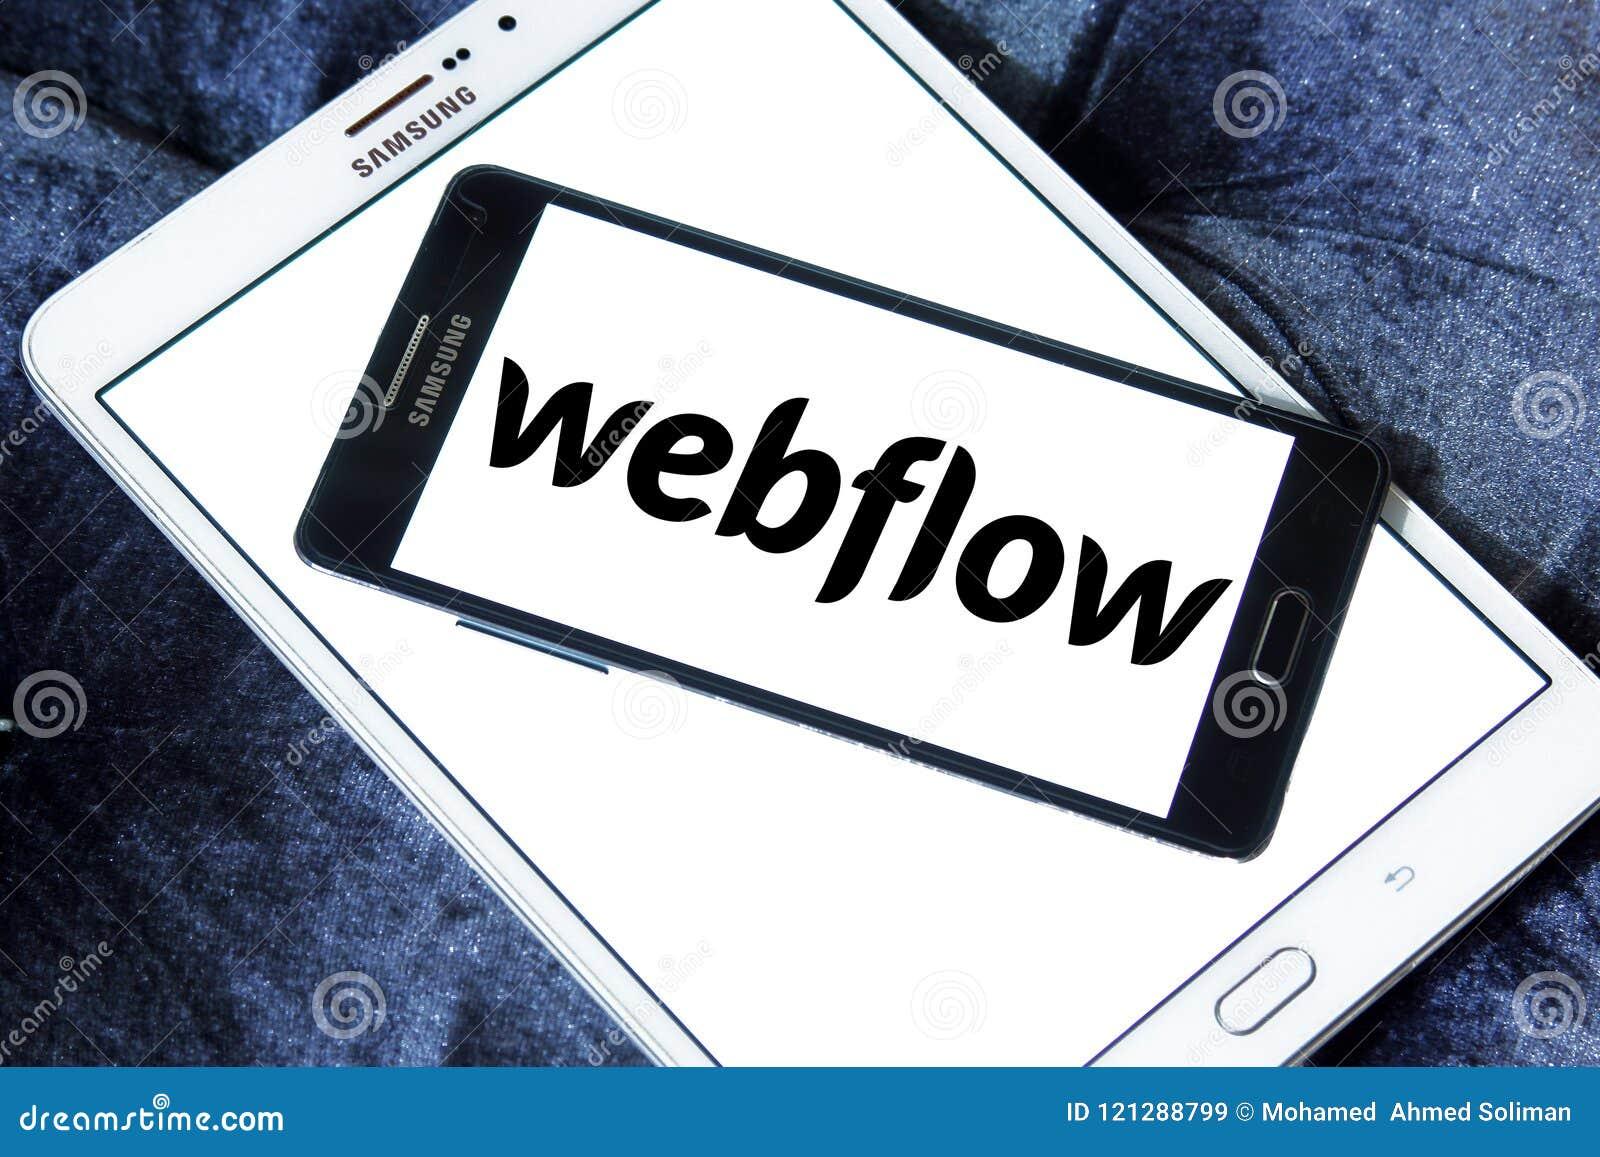 Webflow Software Company Logo Editorial Stock Image - Image